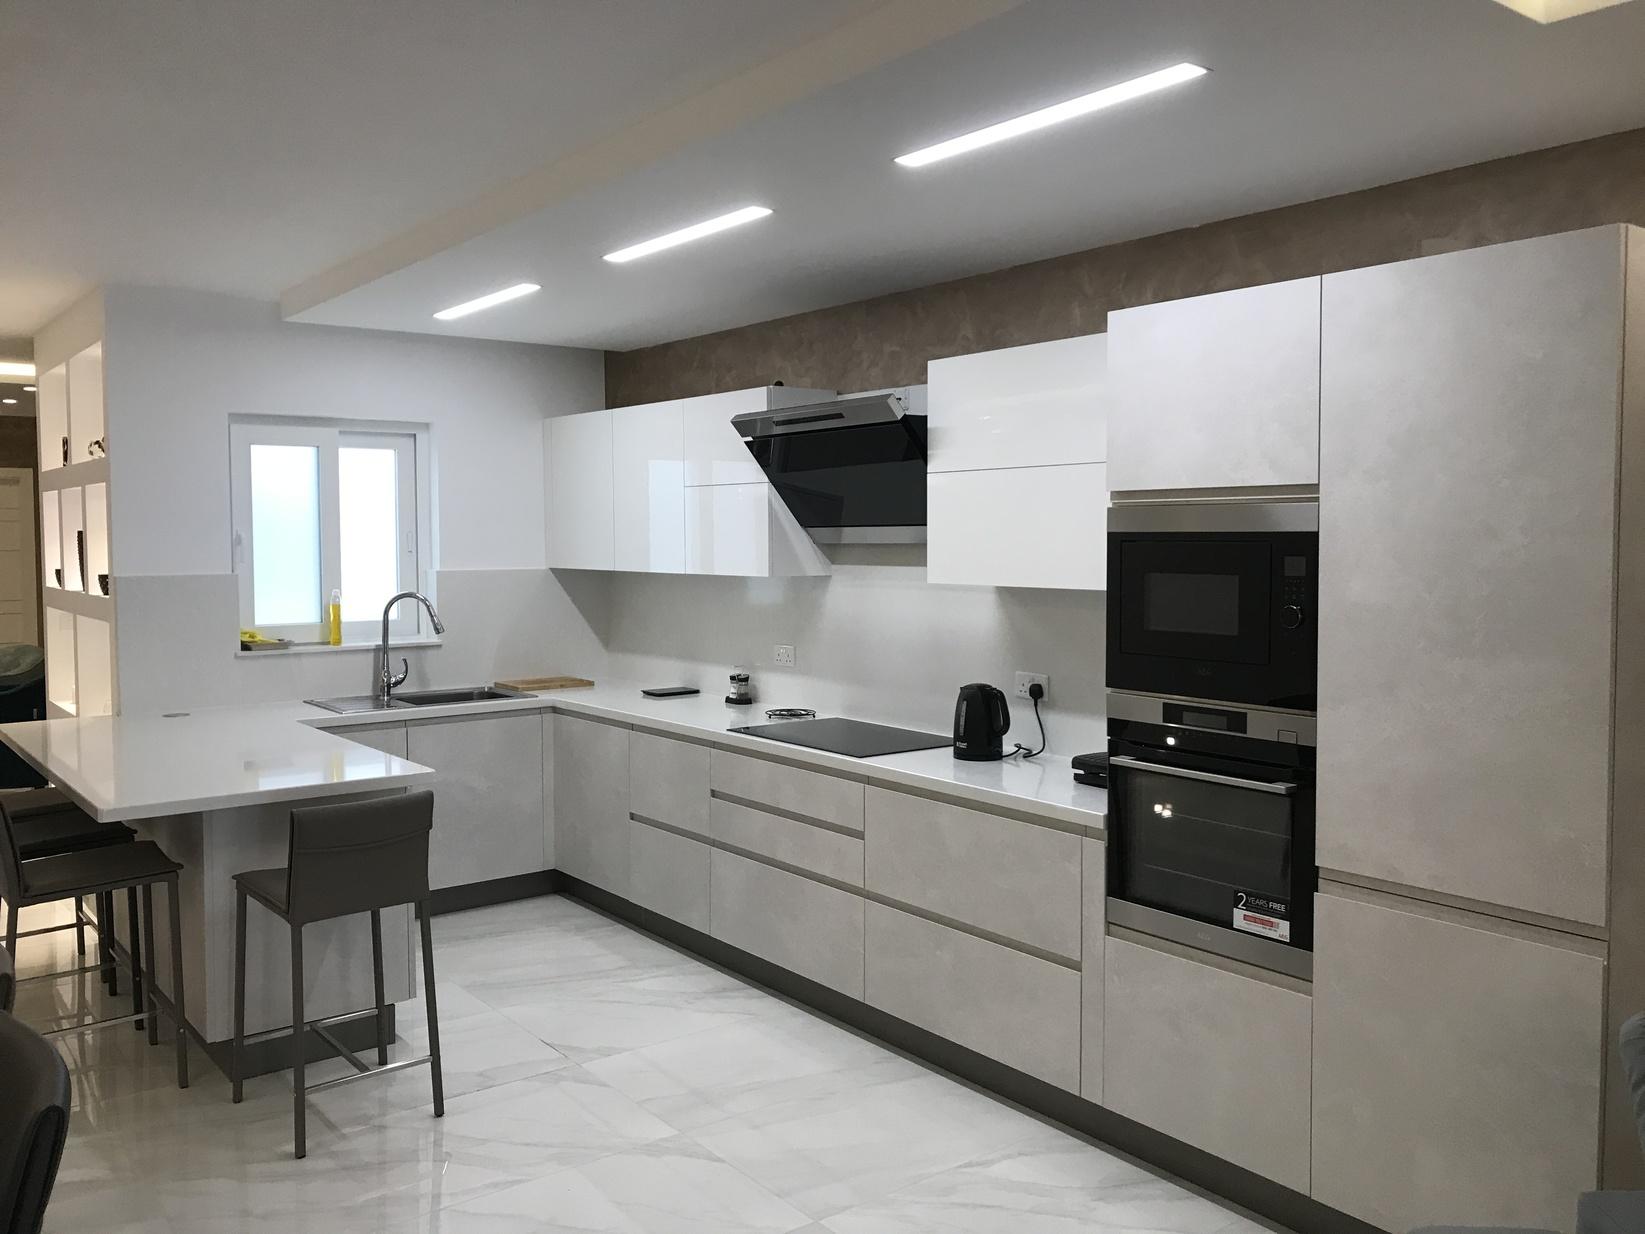 3 bed Apartment For Rent in Qawra, Qawra - thumb 4